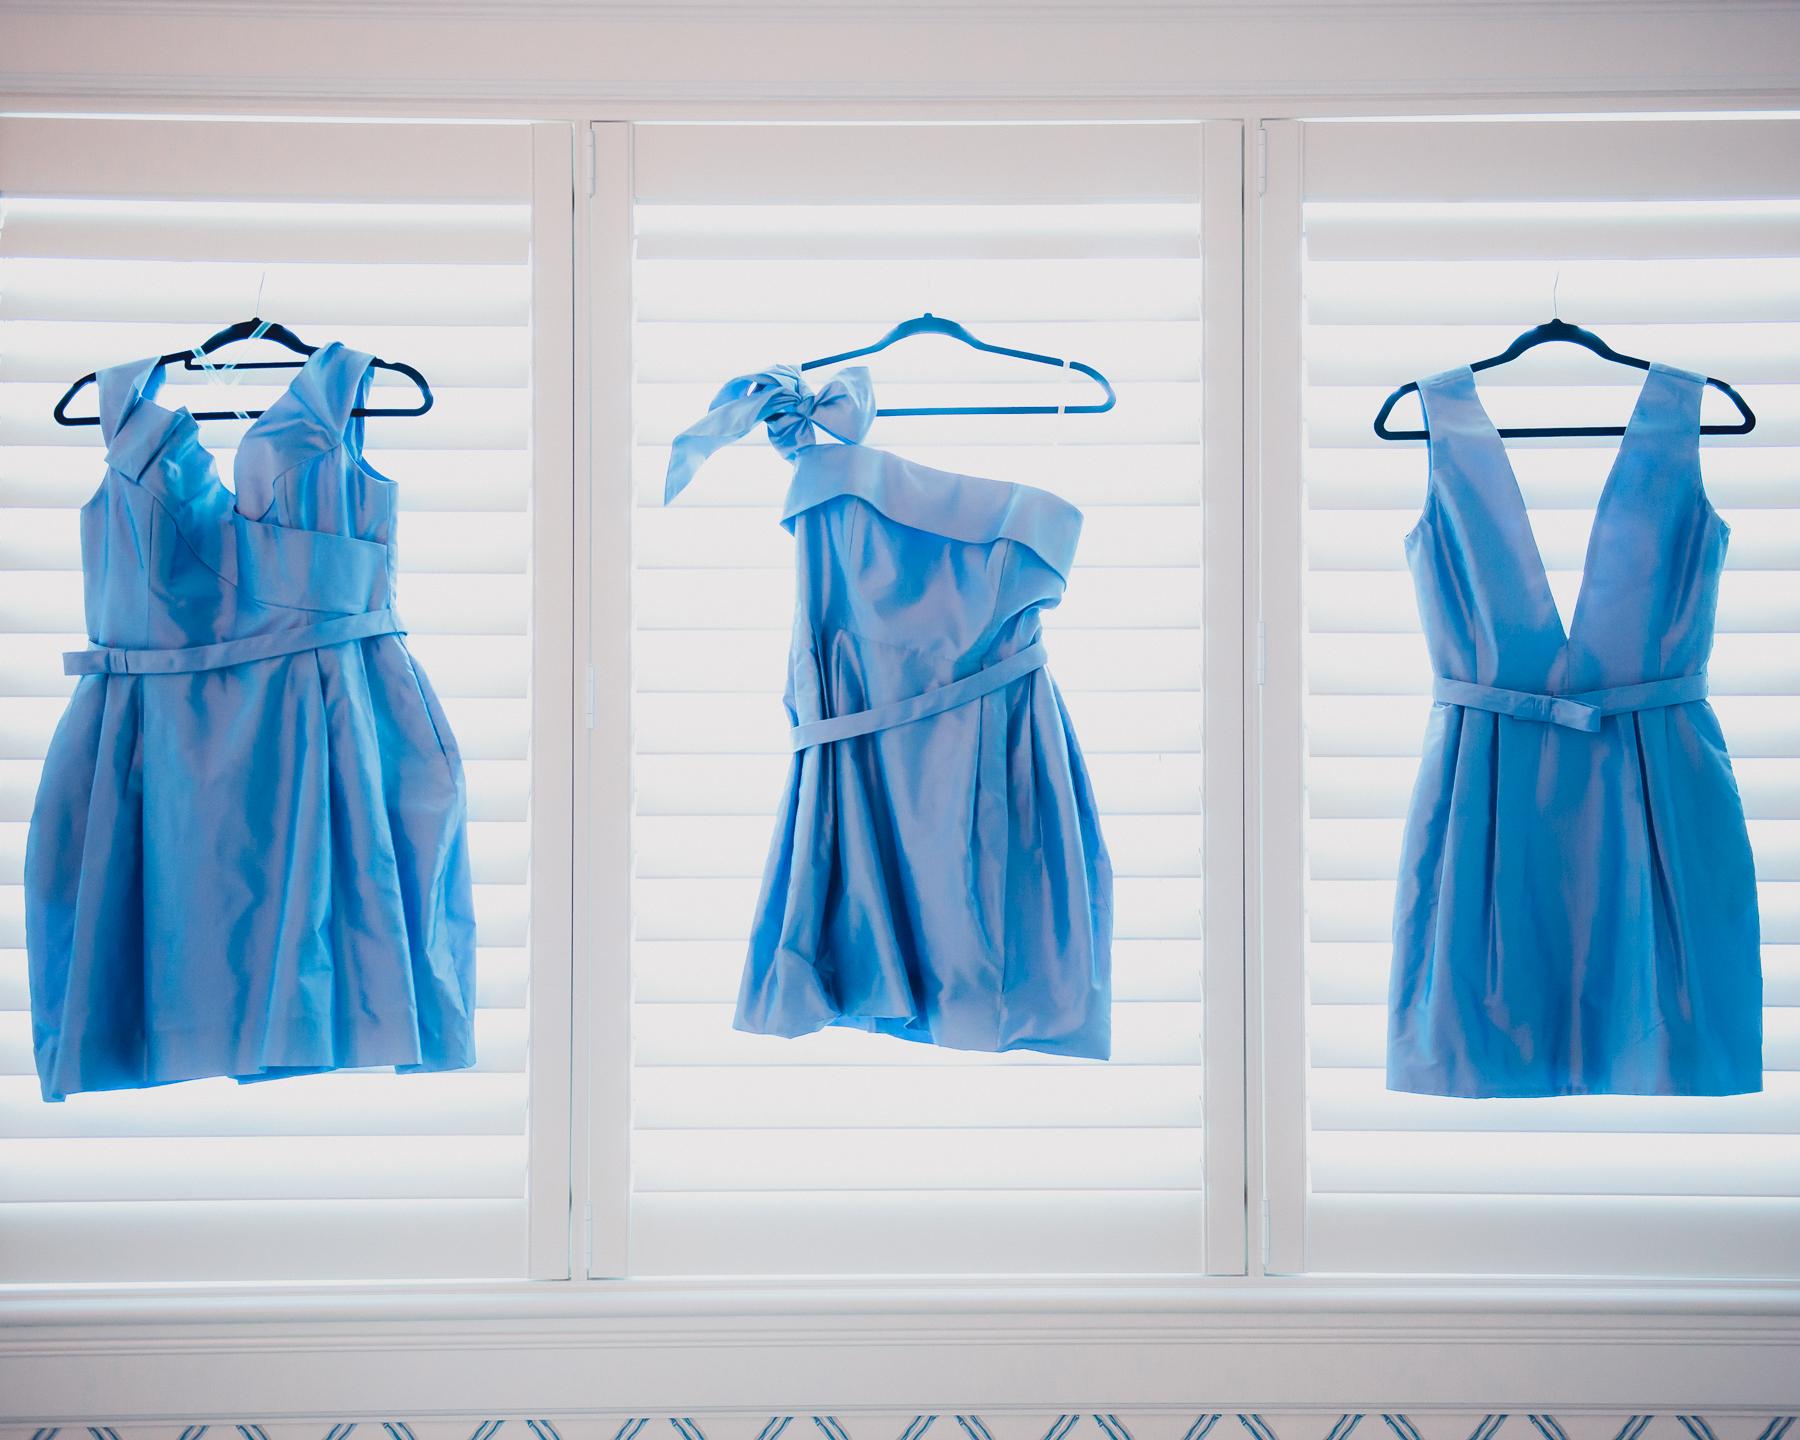 Bridesmaid's dresses are set